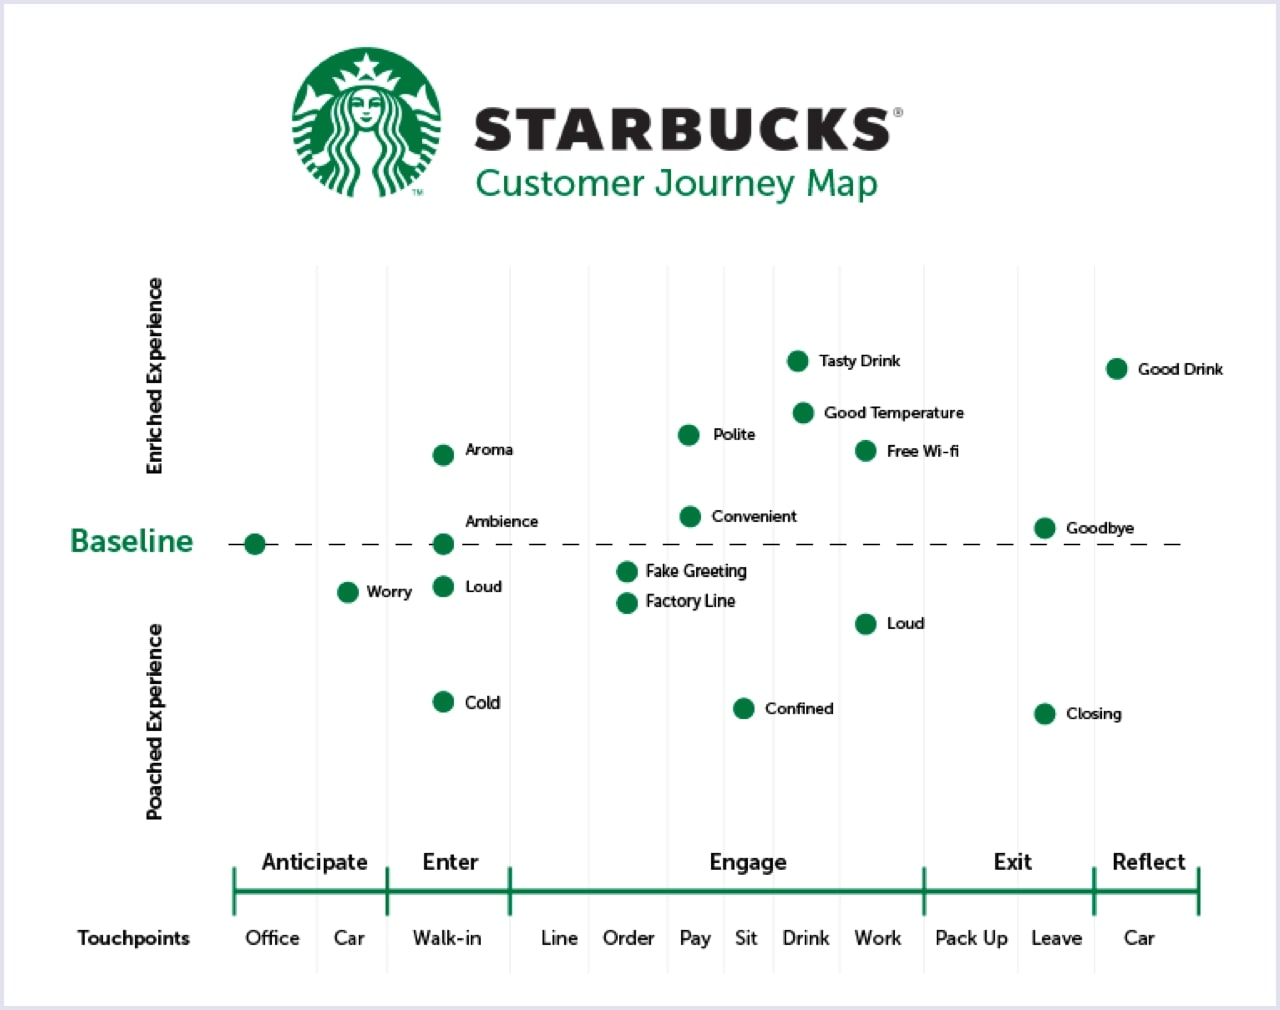 Example of Customer Journey Map: Starbucks | Codica